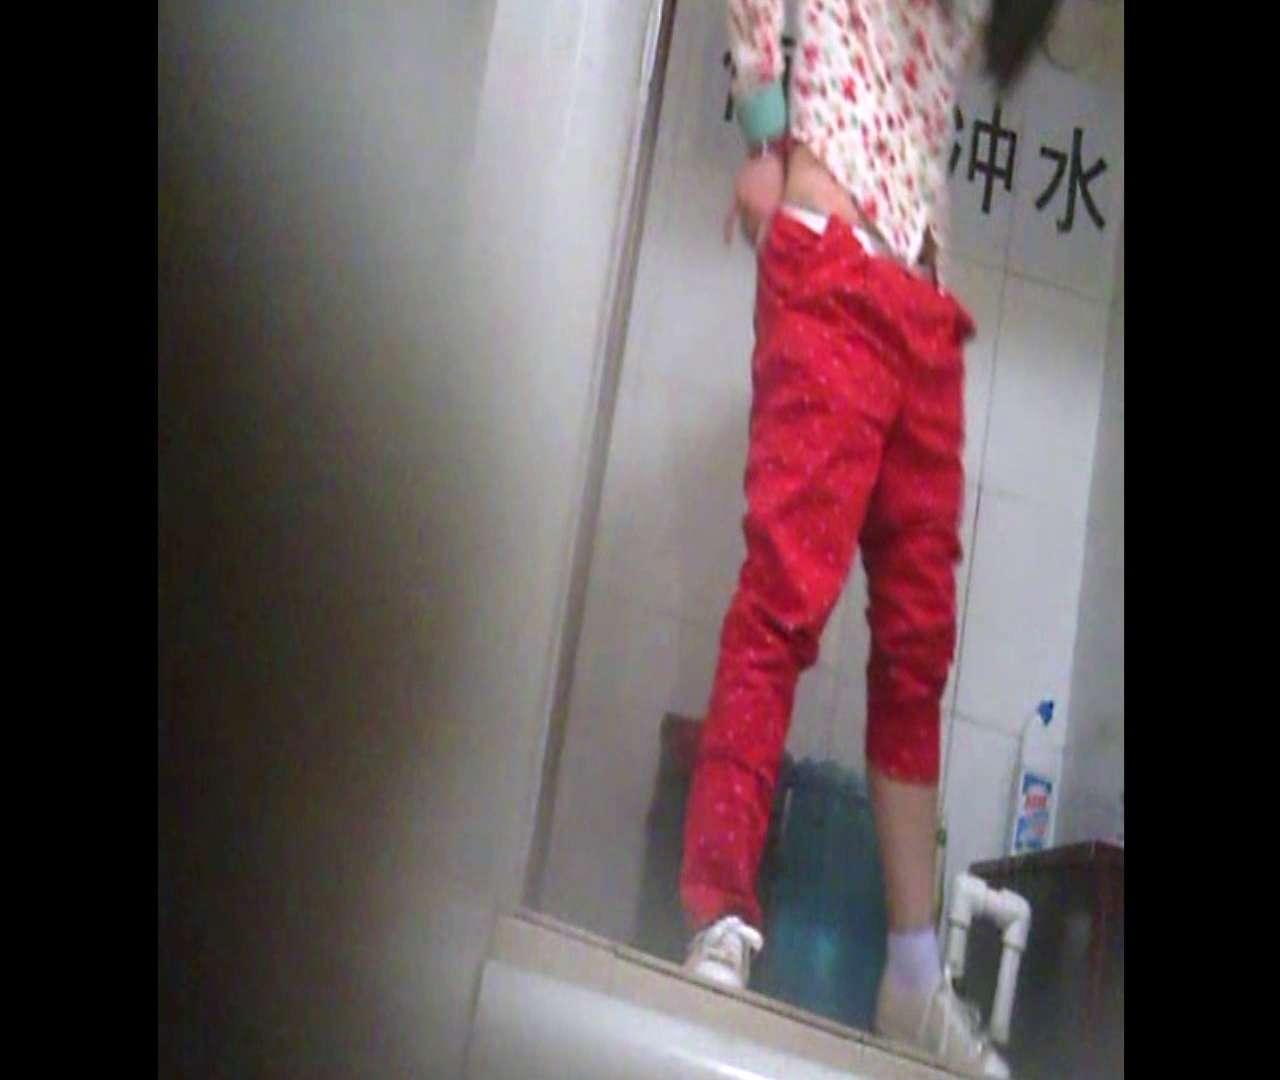 Vol.01 赤のパンツスタイルがとっても眩しい!! 洗面所 | 丸見え  61画像 58